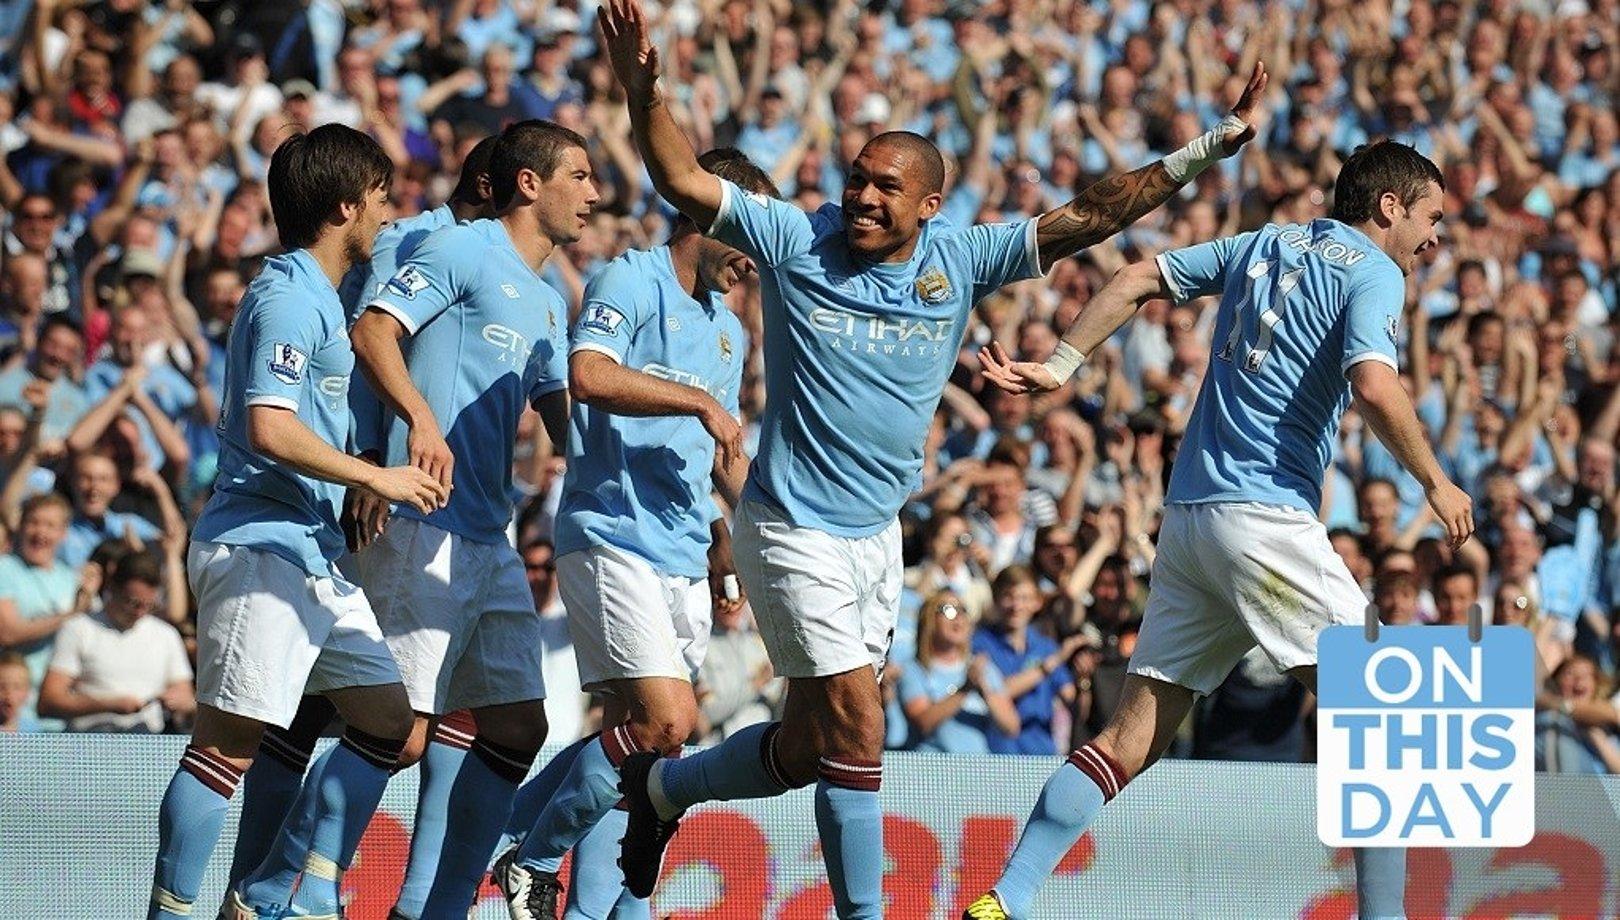 On this day: De Jong scores... finally